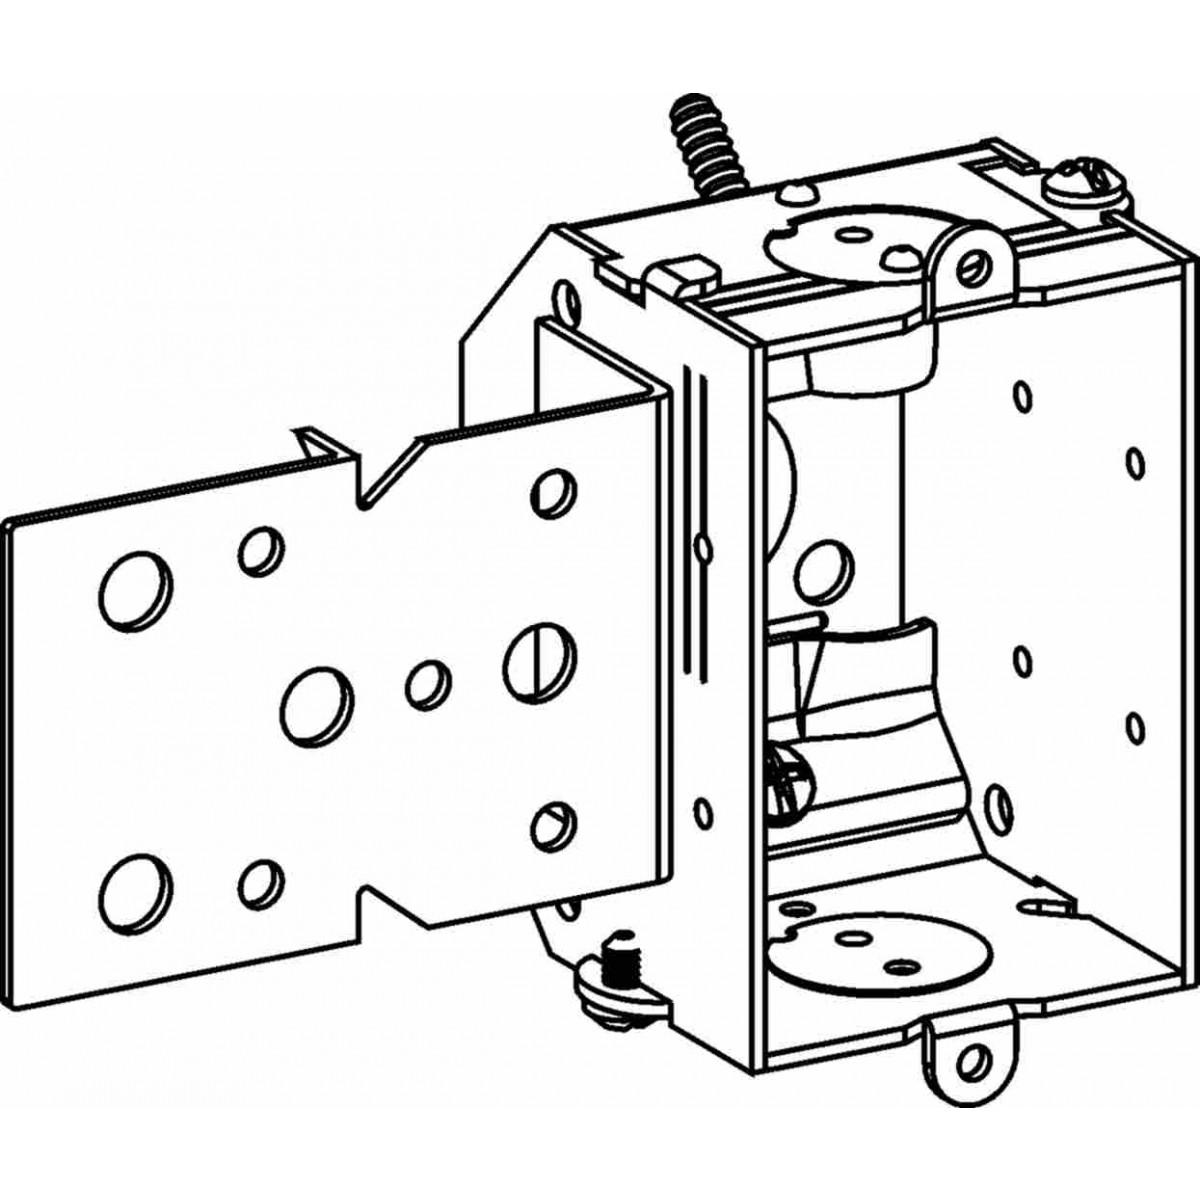 8 x 4 nema 1 junction box  8  free engine image for user